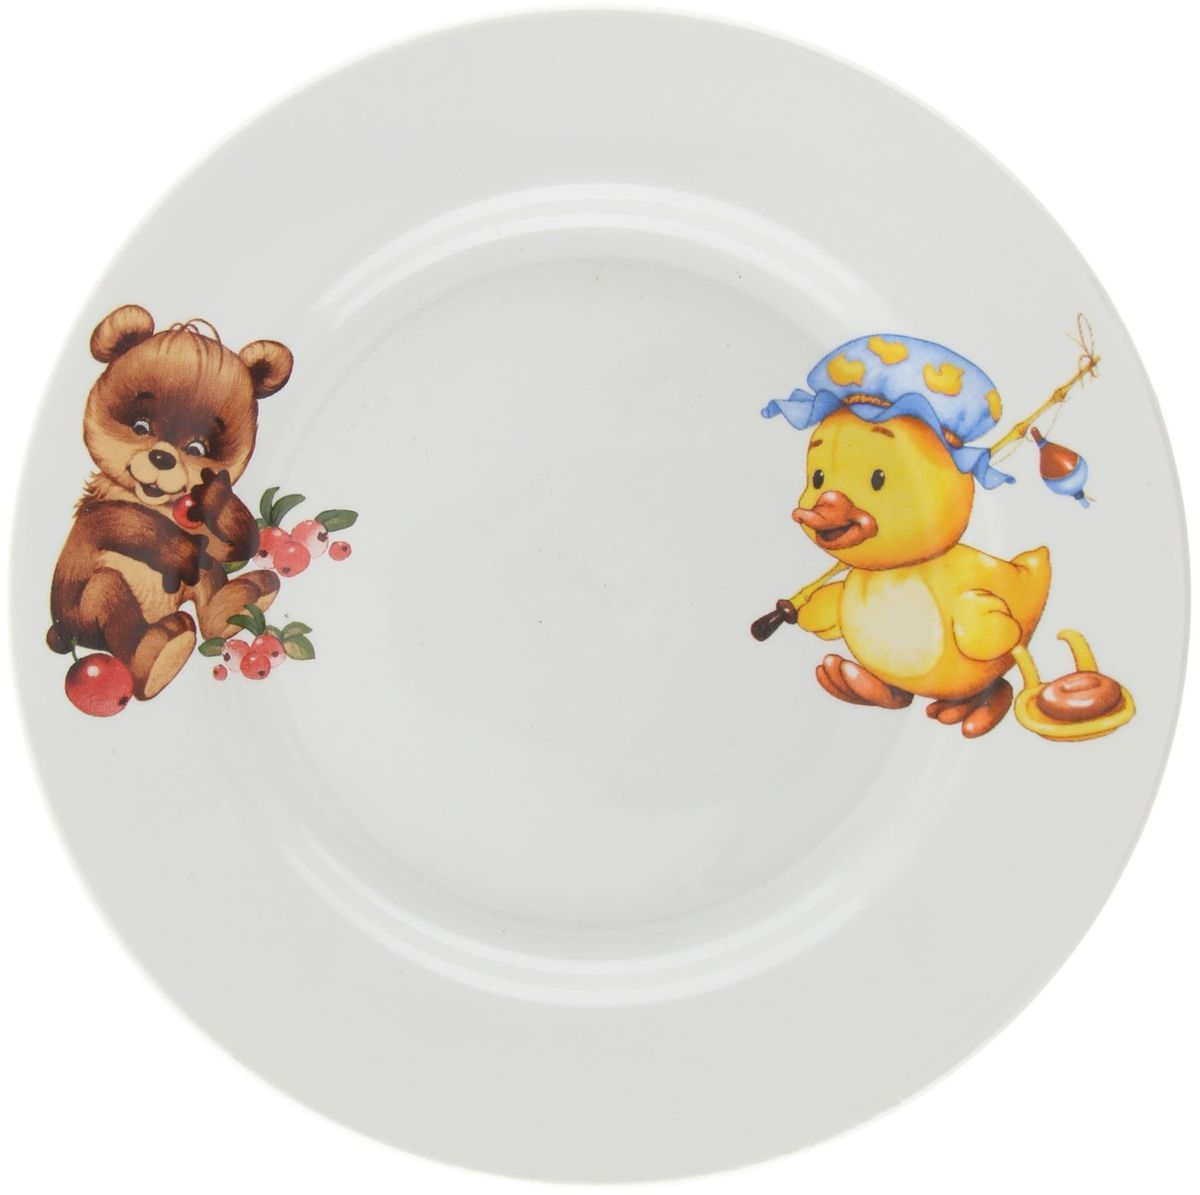 Кубаньфарфор Тарелка детская Утенок Медвежонок детская посуда